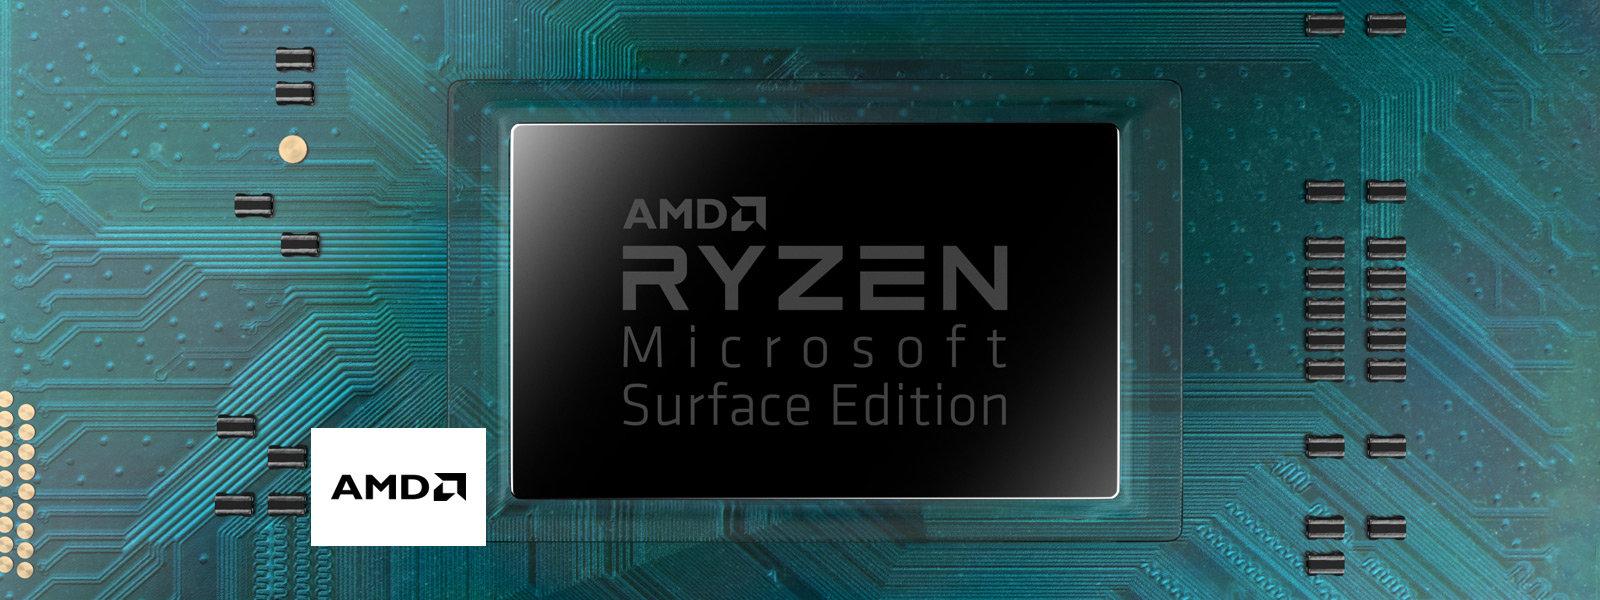 An AMD Ryzen processor.